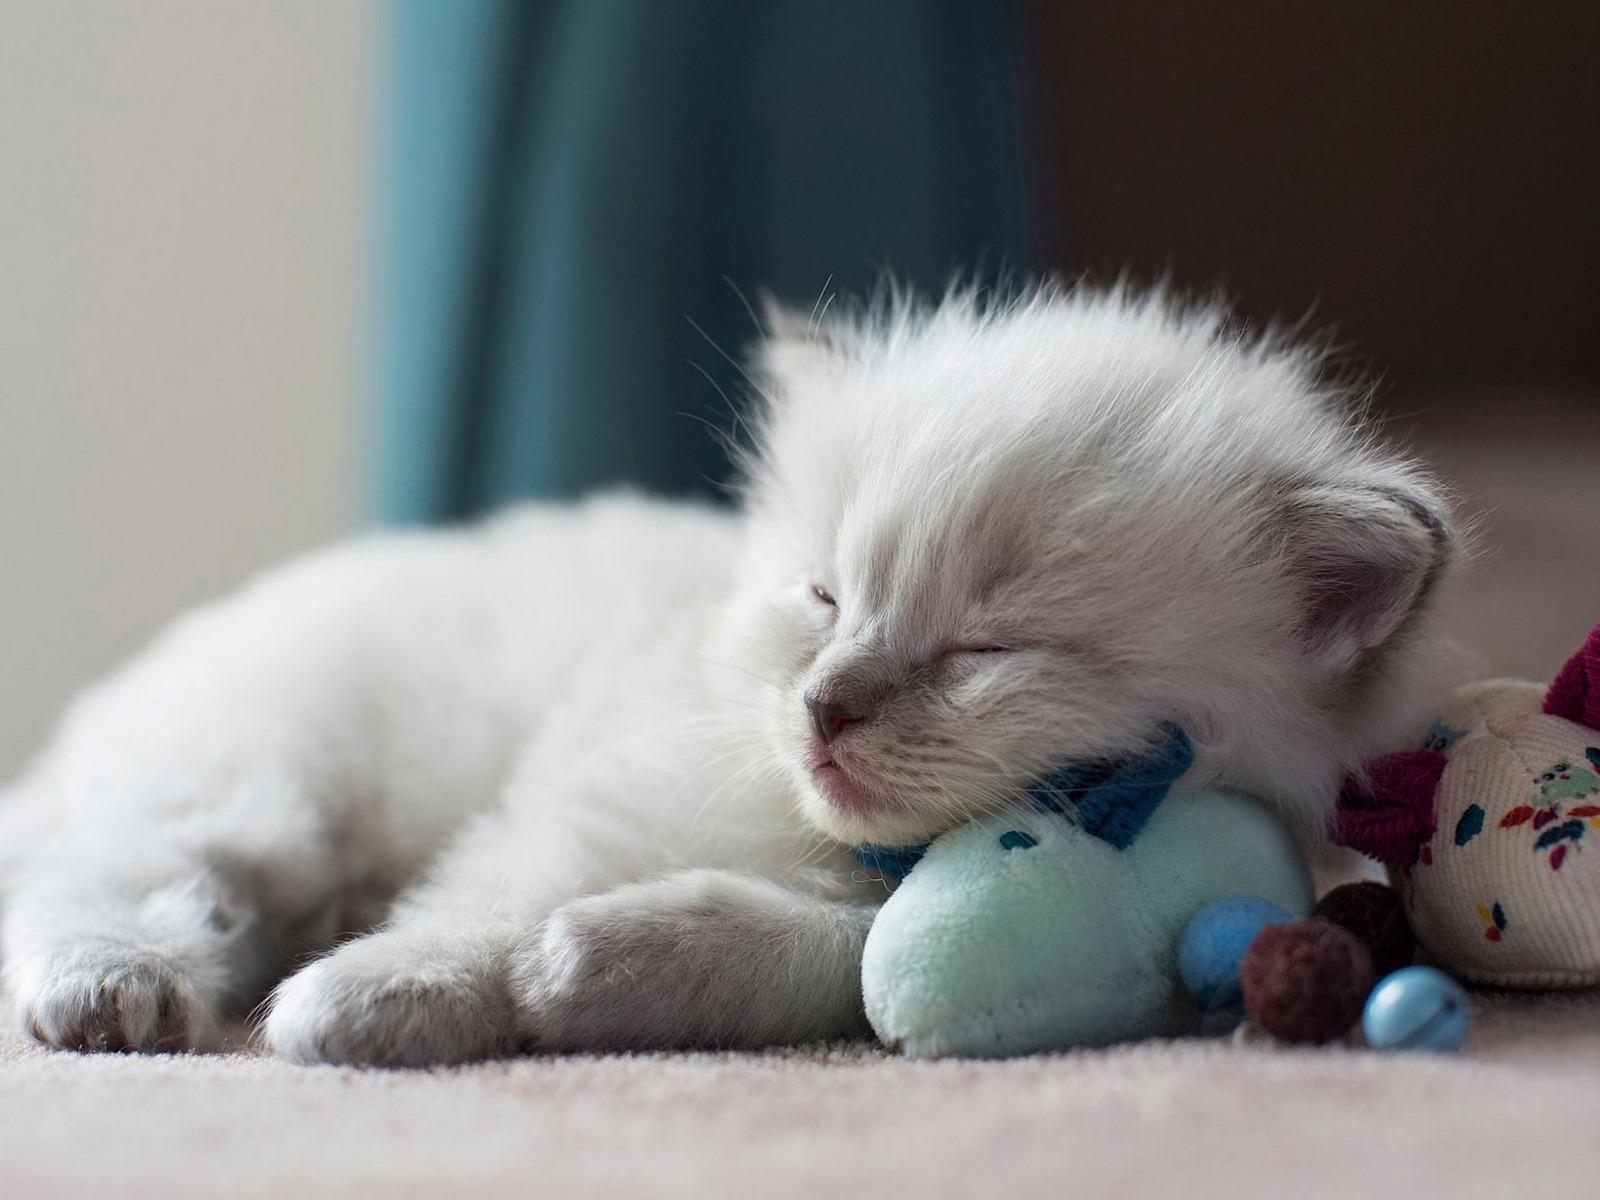 Картинки котик спит с игрушкой, юбилеем